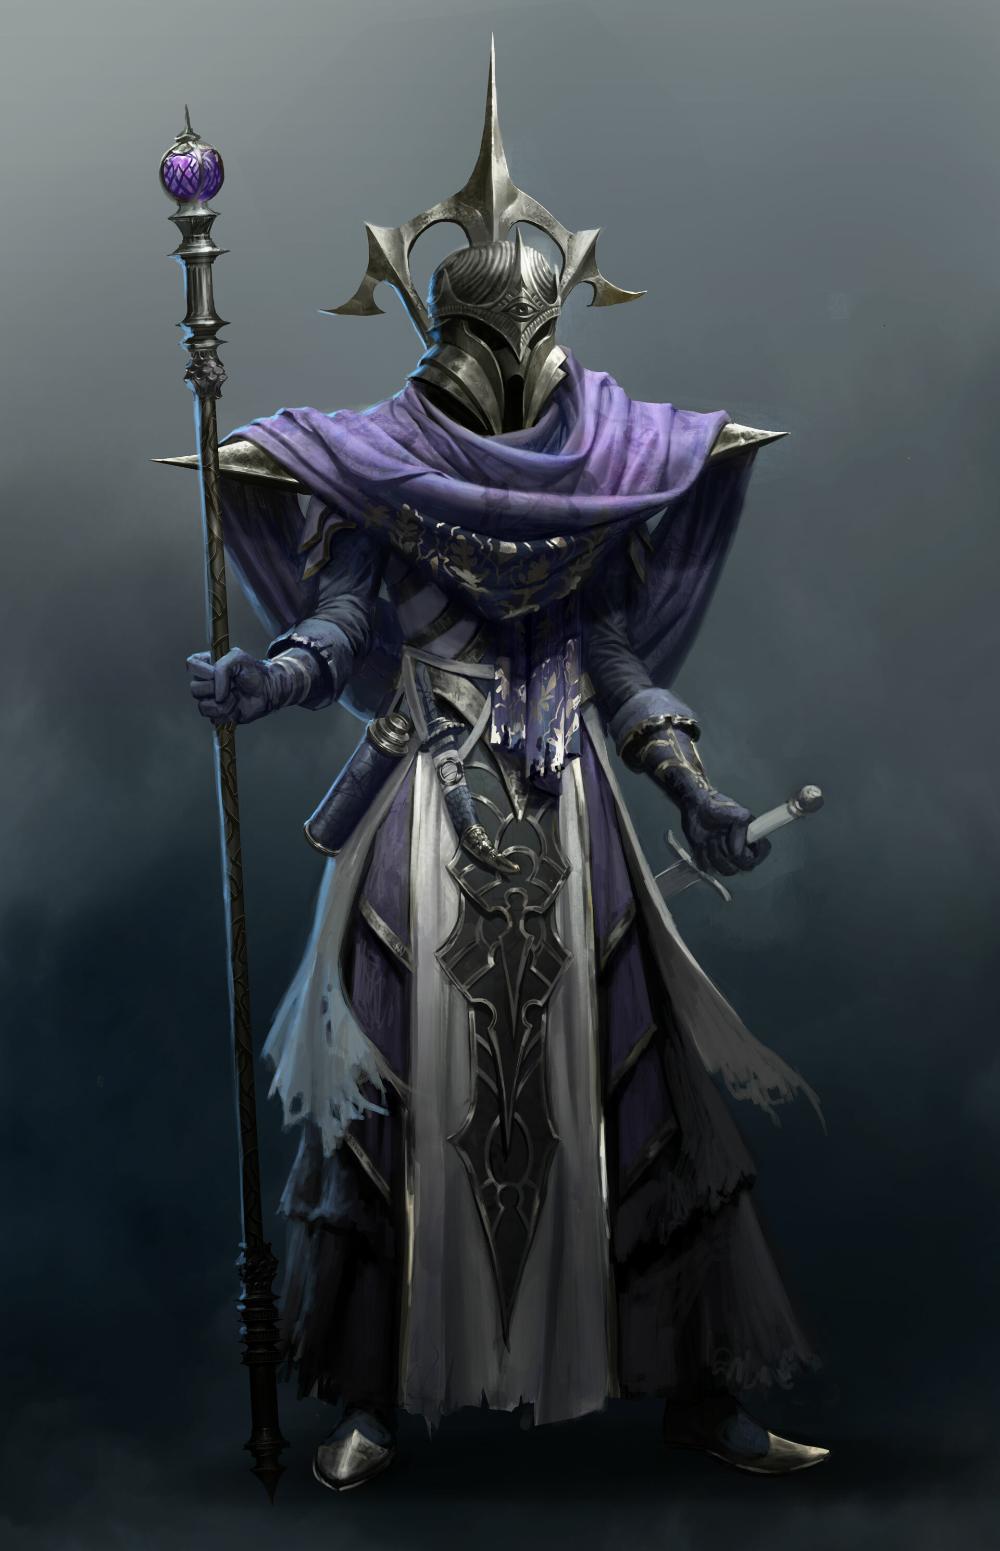 ArtStation - SPELLFORCE III - Darkelf Armor concept, Moritz Lacusteanu